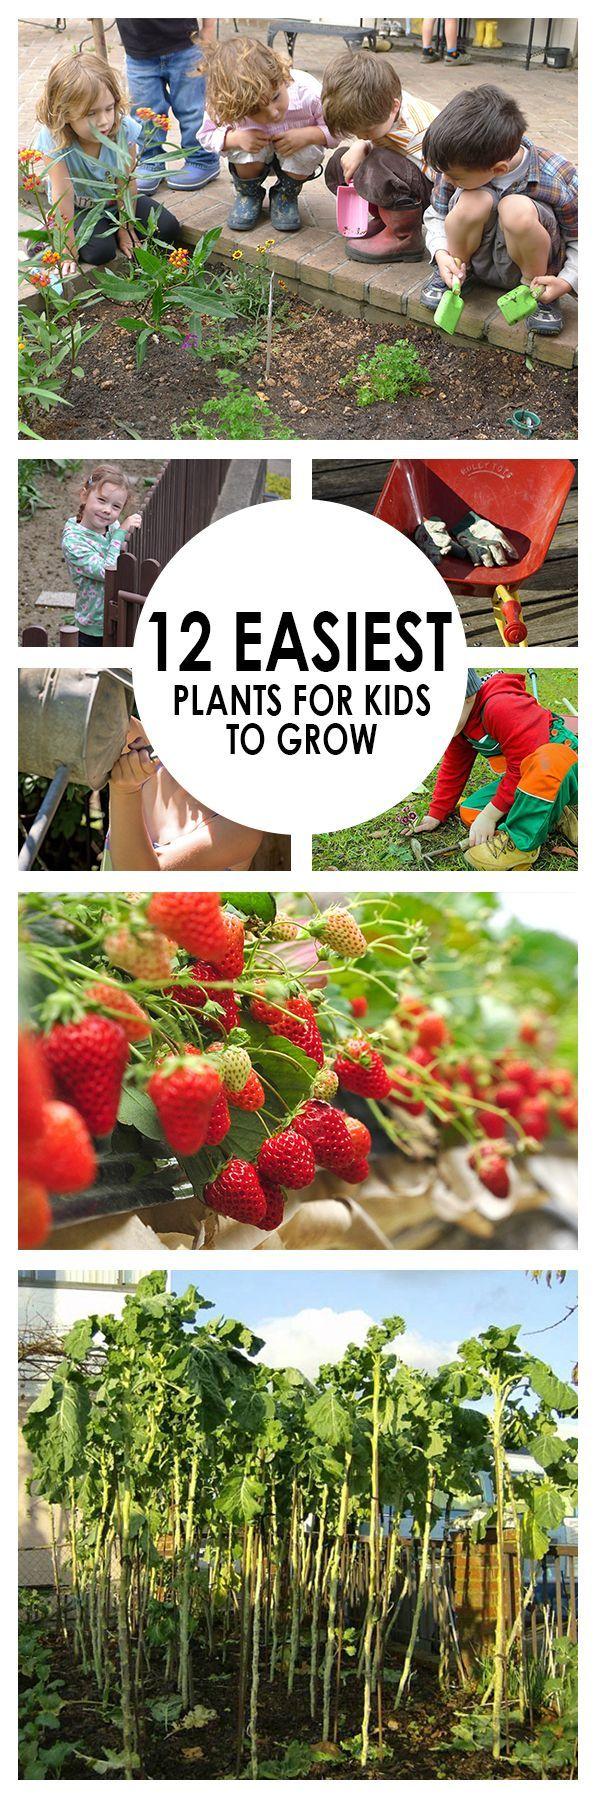 Vegetable garden pictures for kids - 12 Easiest Plants For Kids To Grow Gardening With Kidsgardening Hacks Vegetable